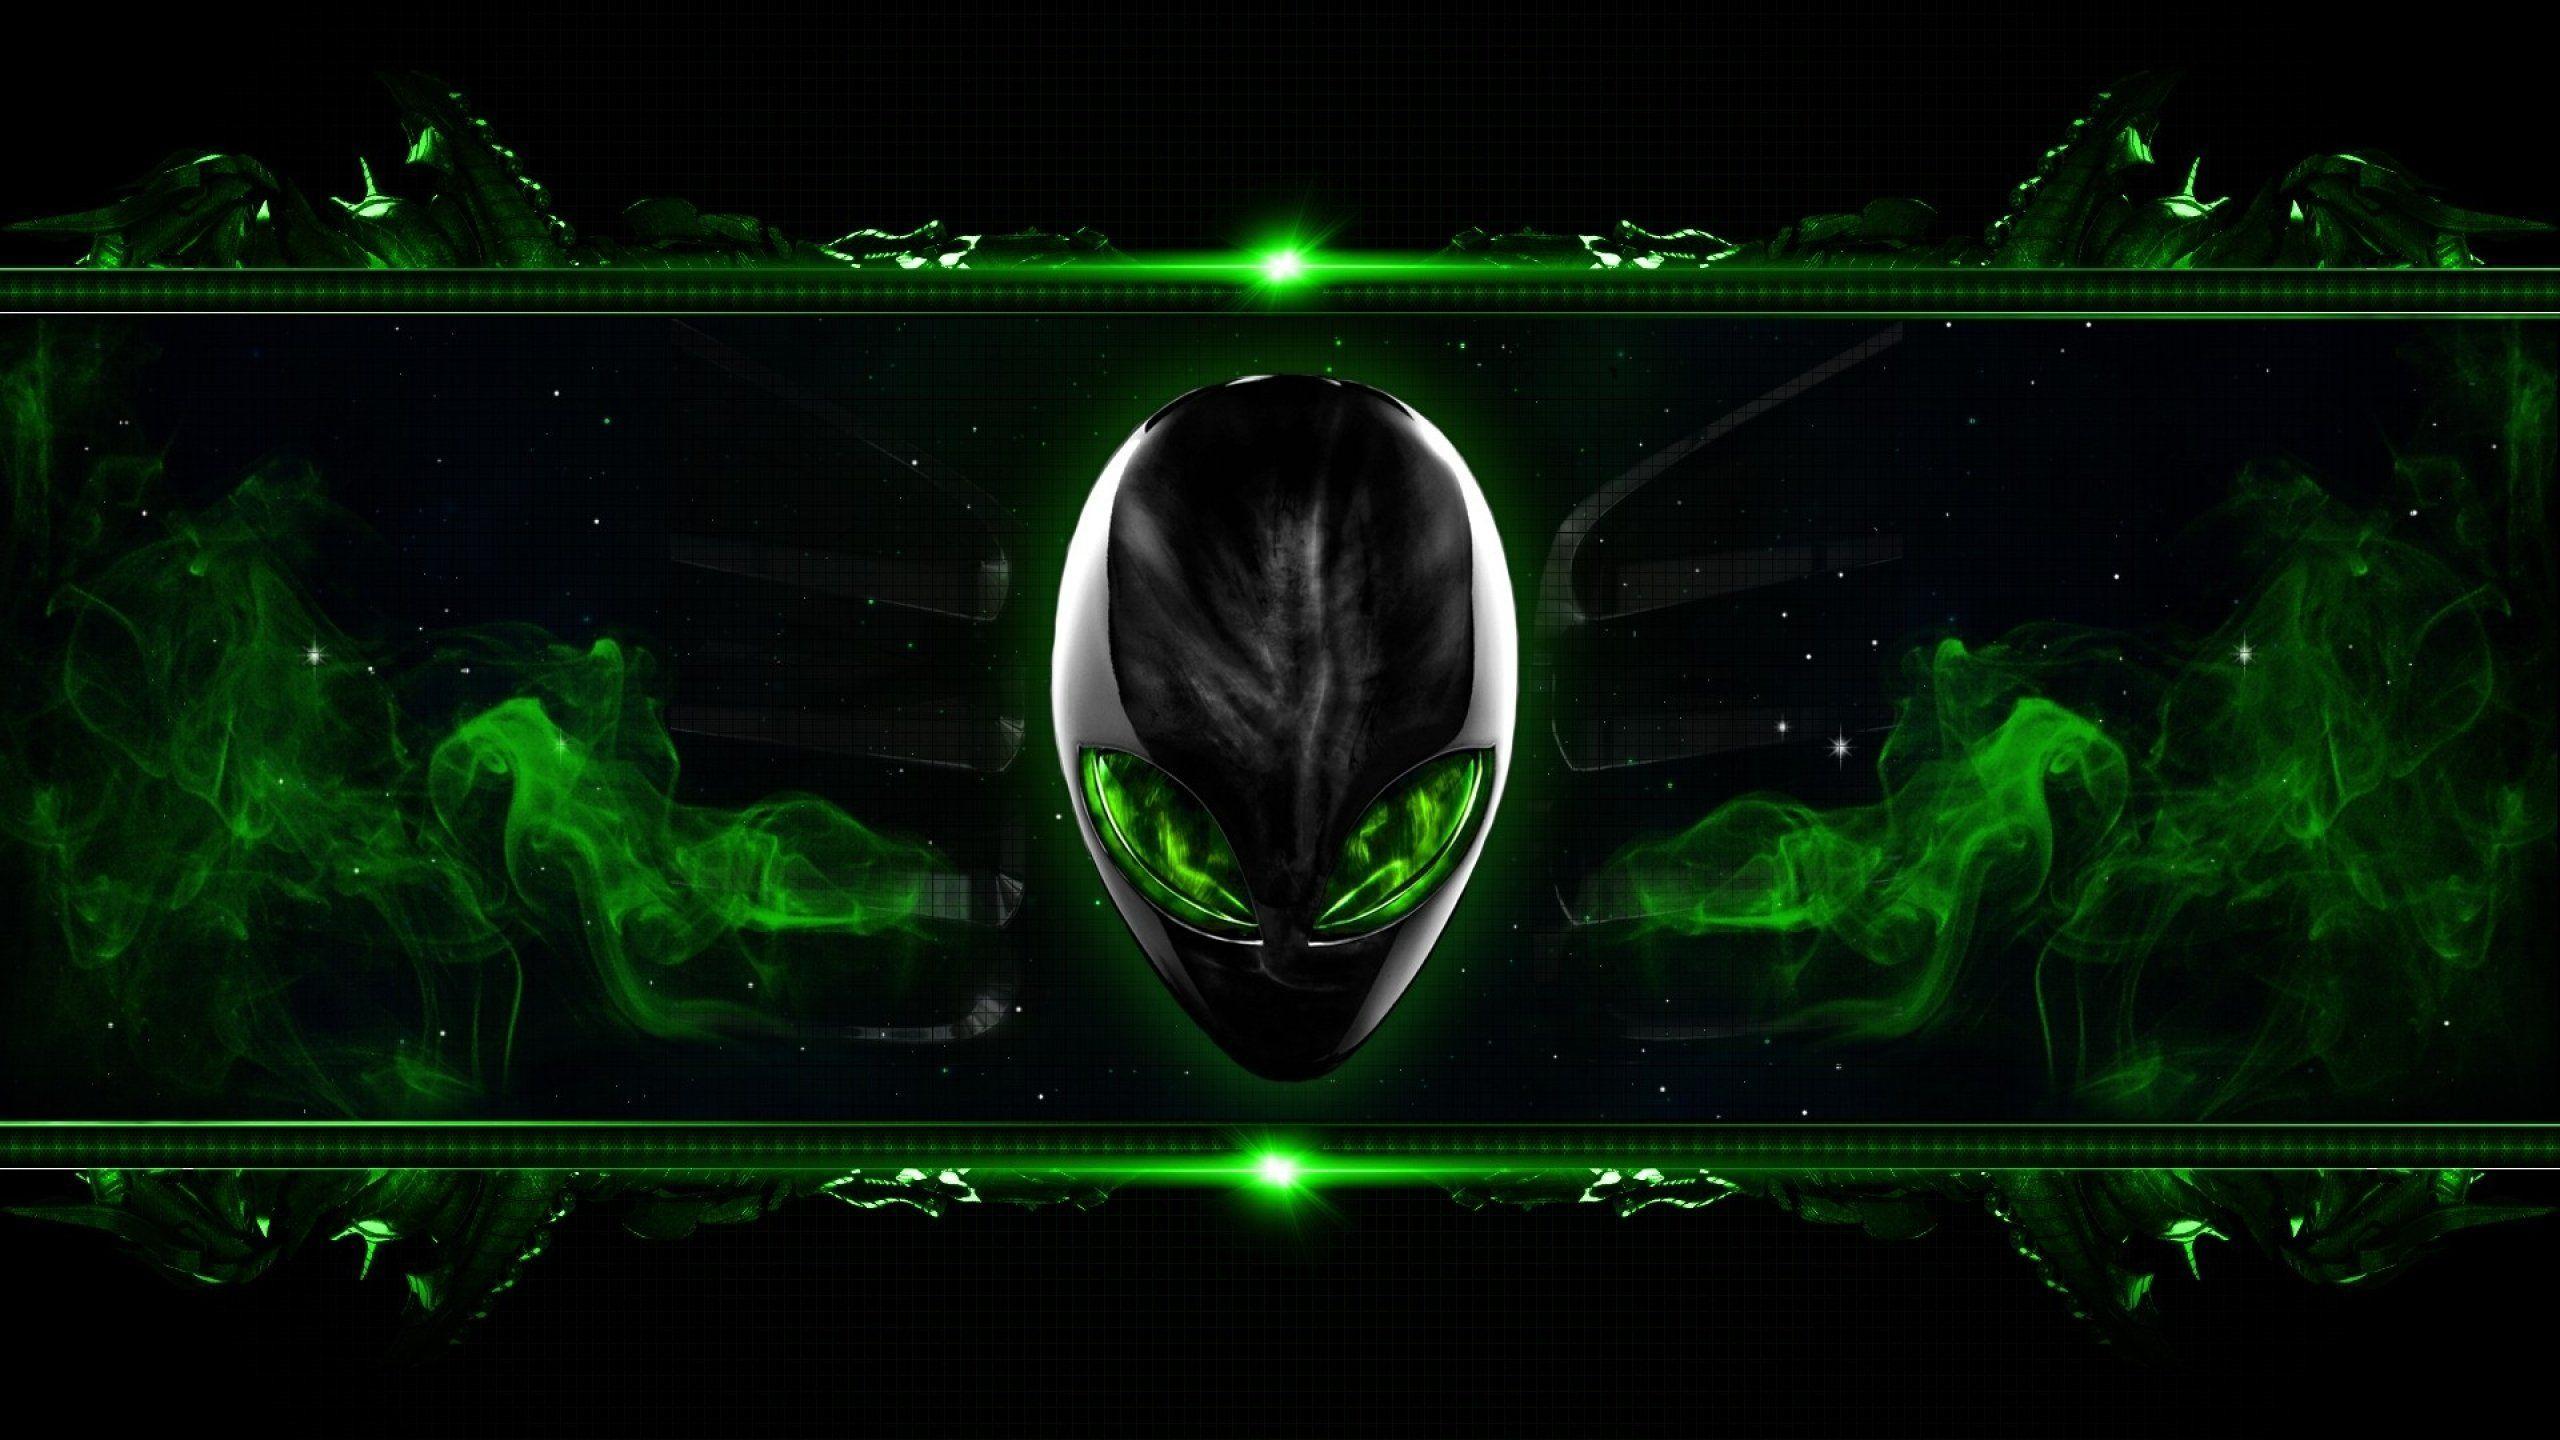 Alienware 4k Ultra Hd Wallpapers Top Free Alienware 4k Ultra Hd Backgrounds Wallpaperaccess